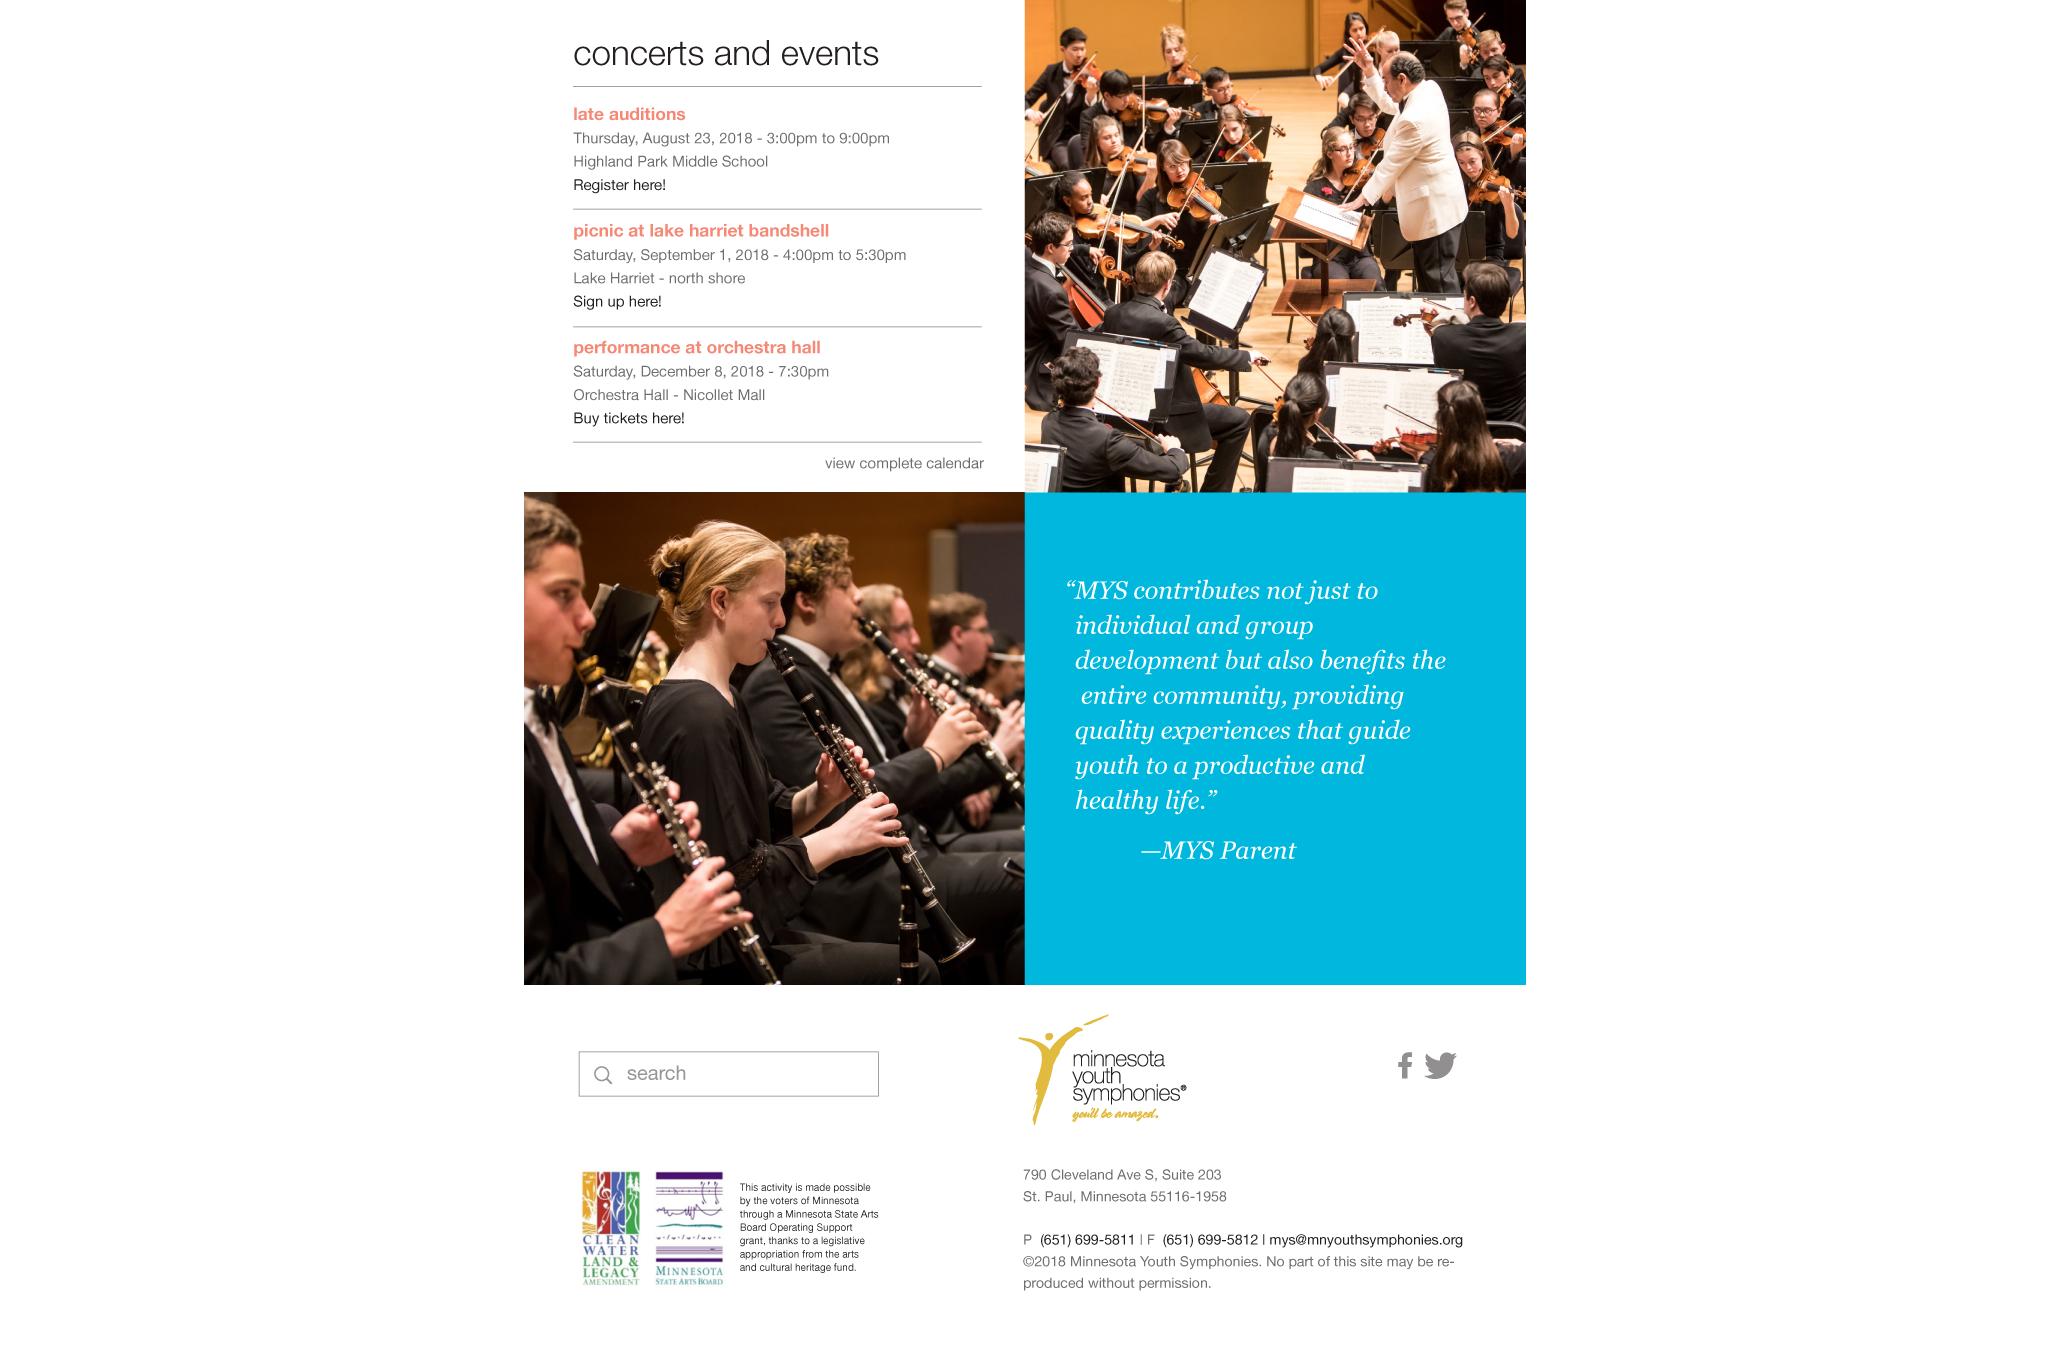 Minnesota Youth Symphonies website